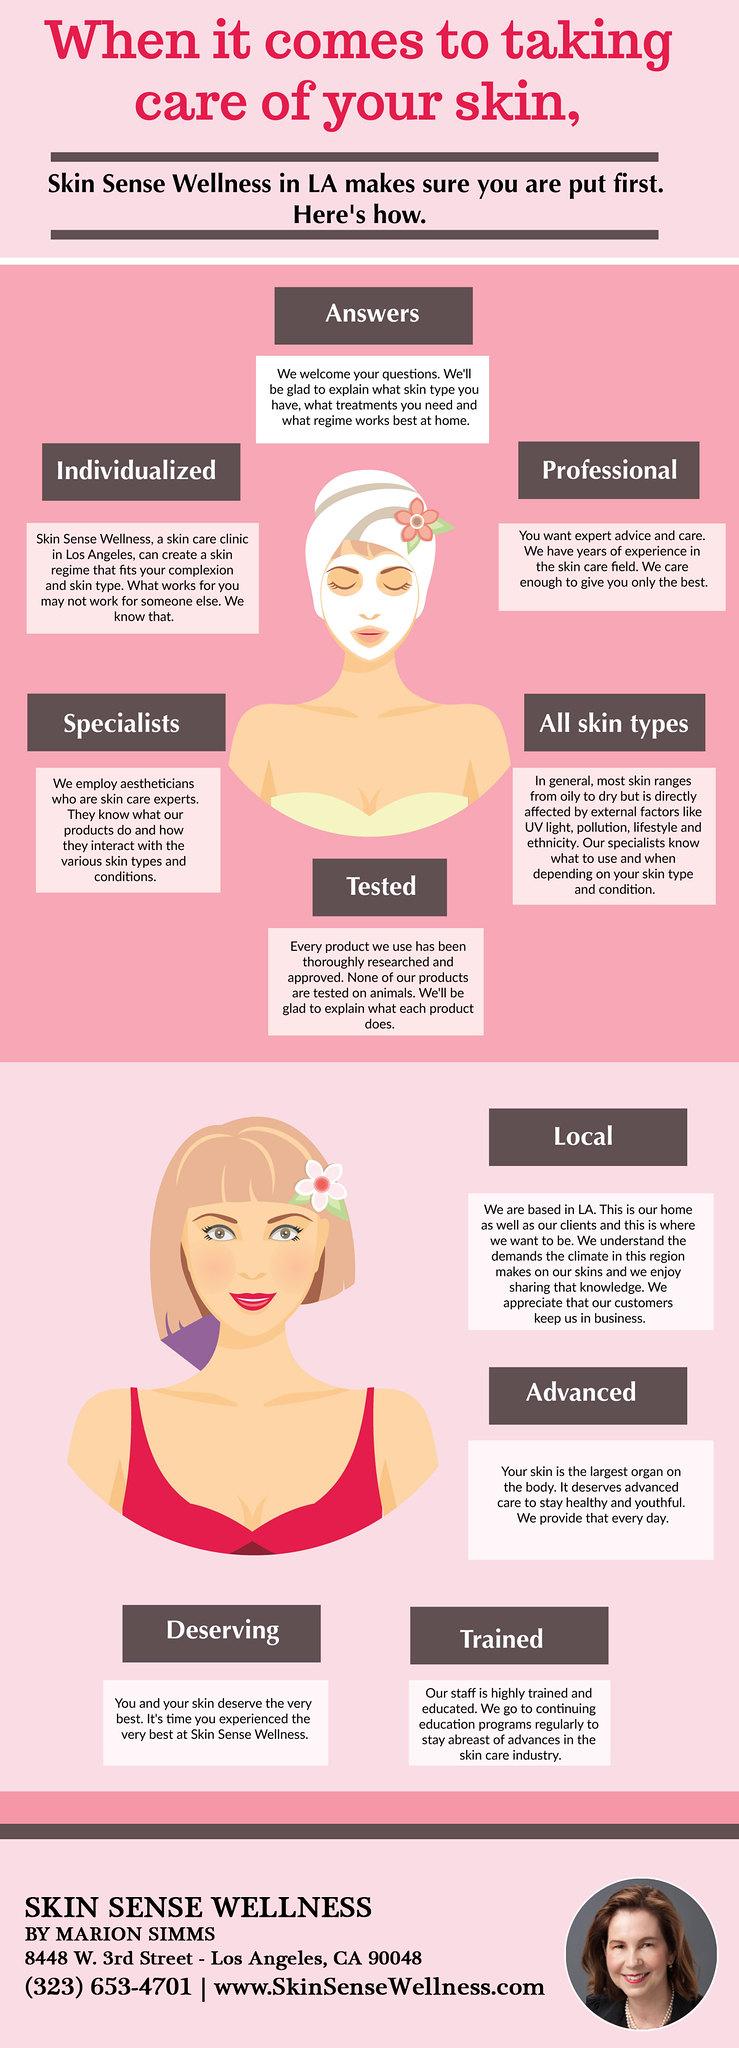 Skin Care Los Angeles - Call Skin Sense Wellness (323) 653-4701